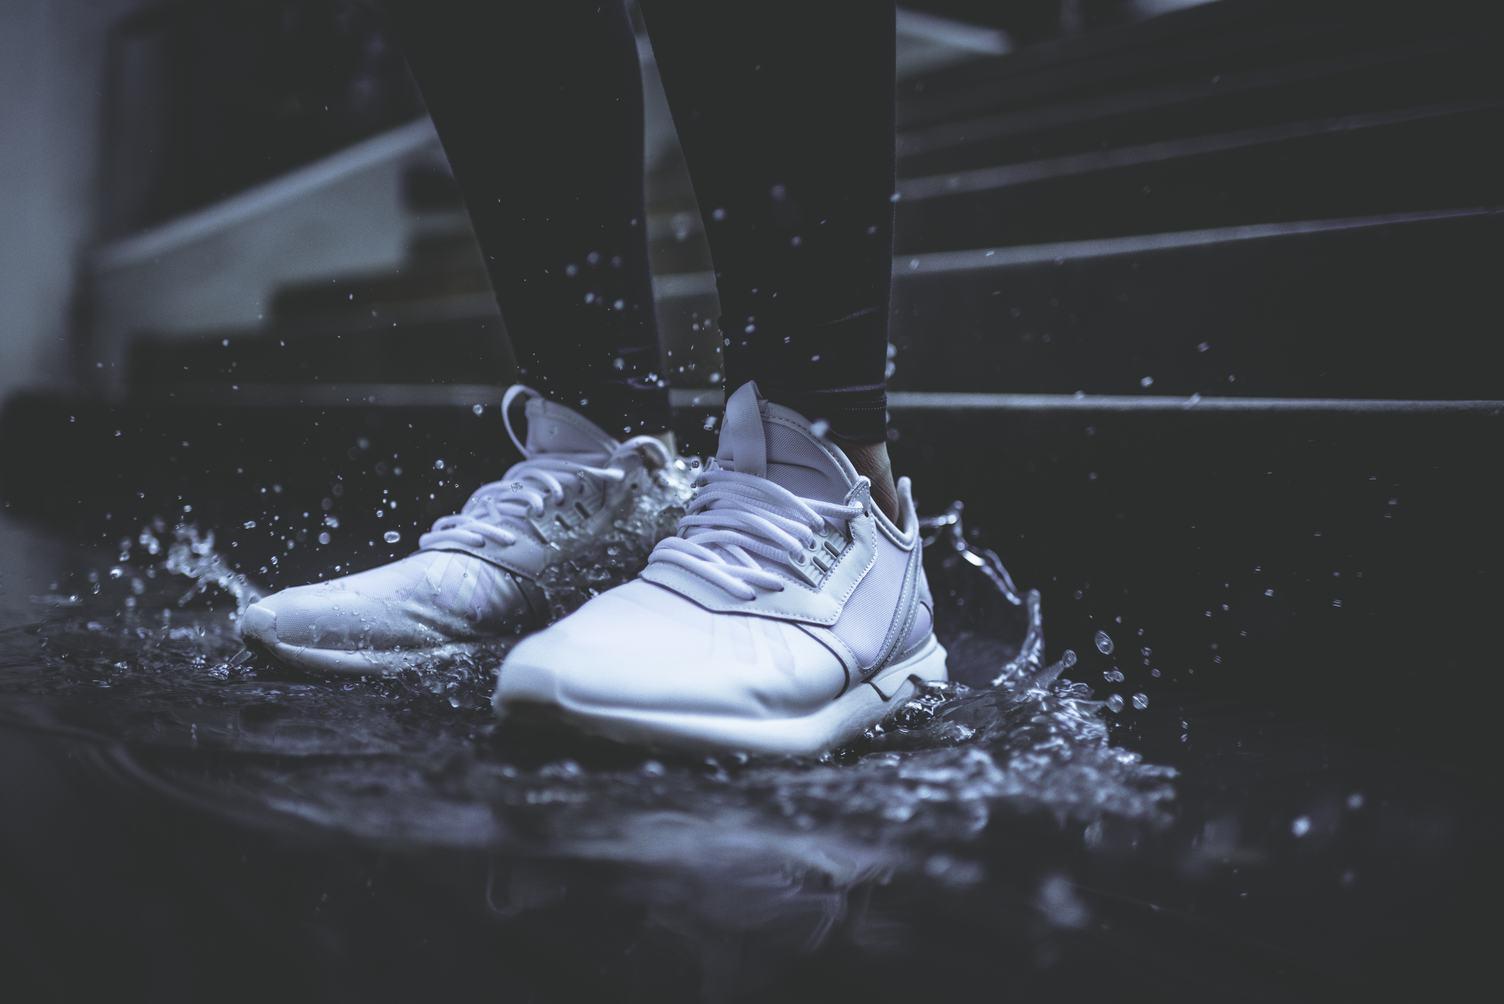 White Sneakers Splashing in Puddle